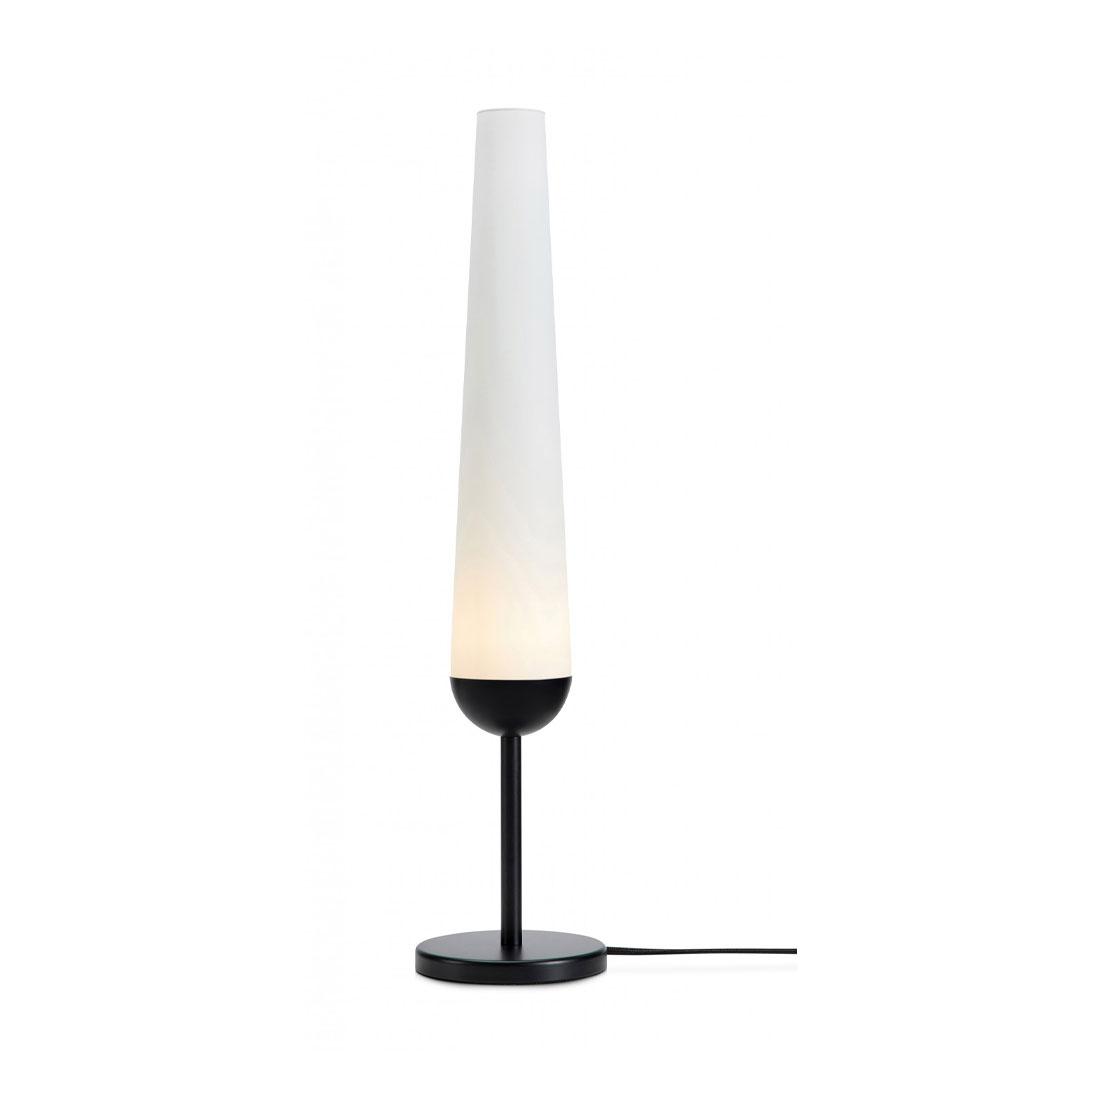 Markslöjd Bern Bordlampe 63cm Svart/Hvit